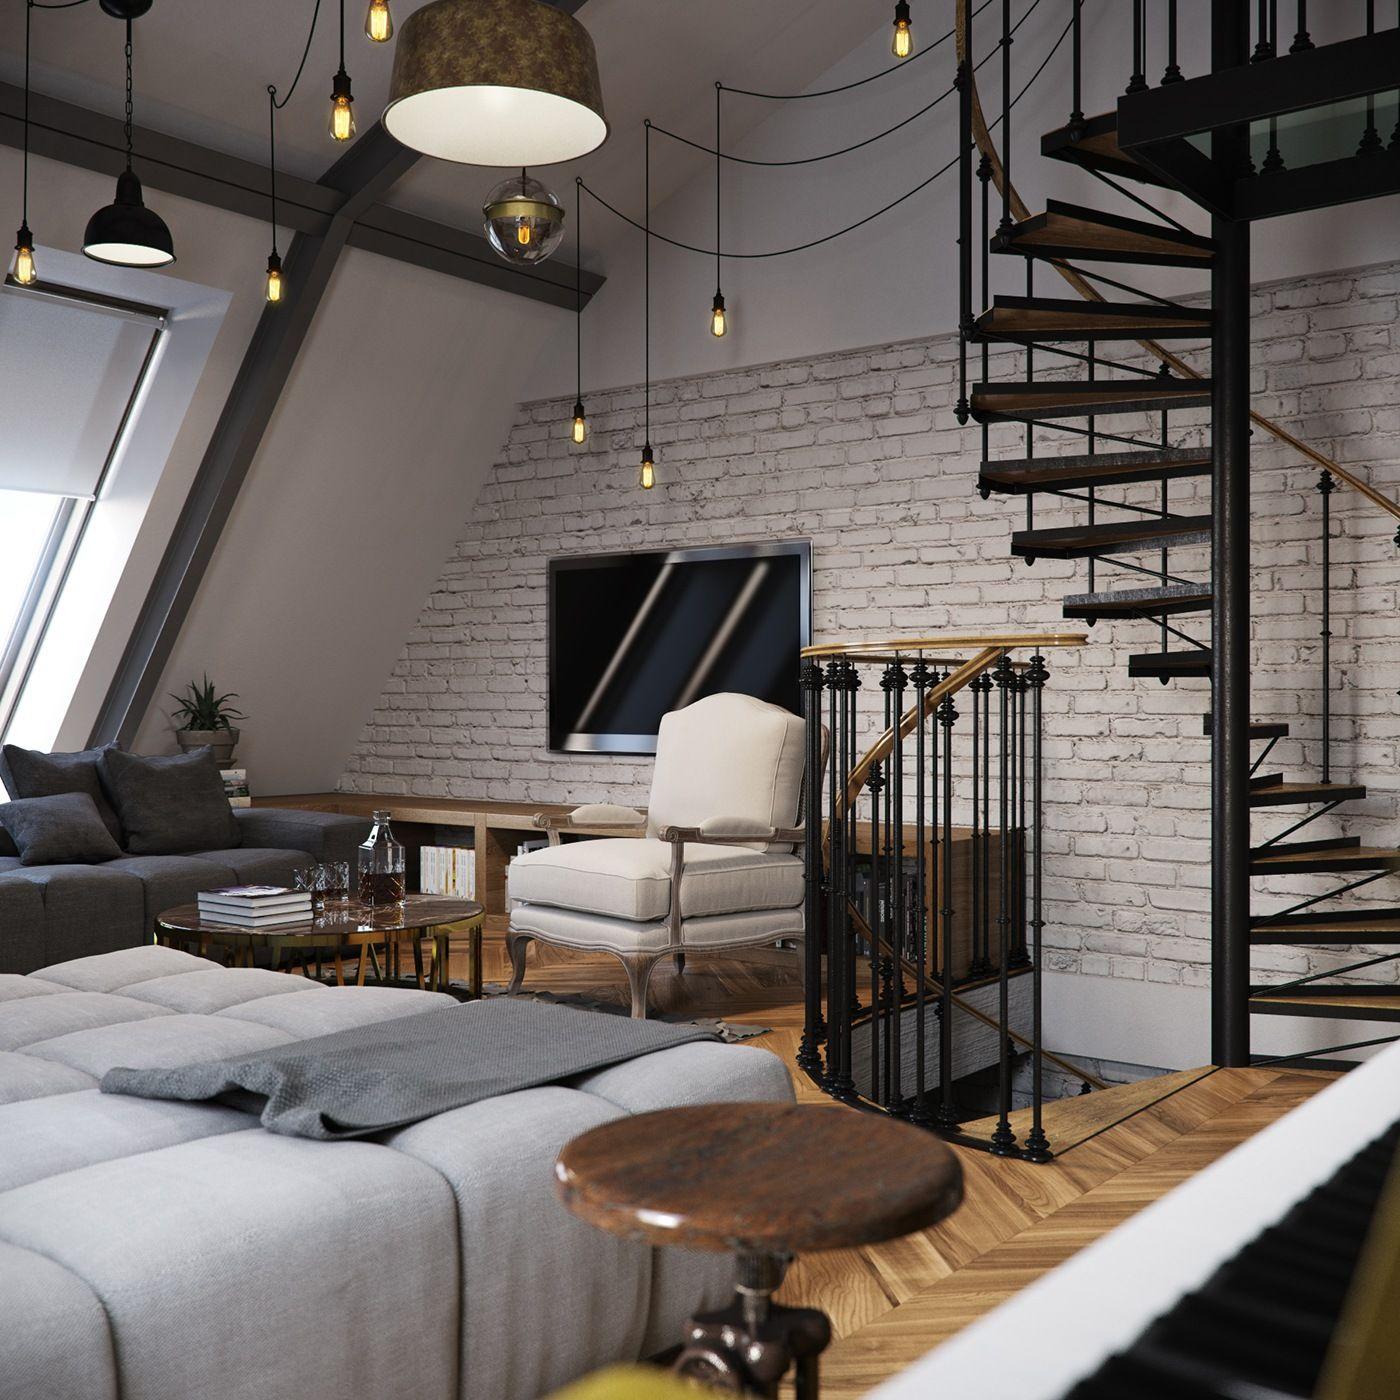 Brick Wall Stencil   Loft style bedroom, Home decor, Faux ...